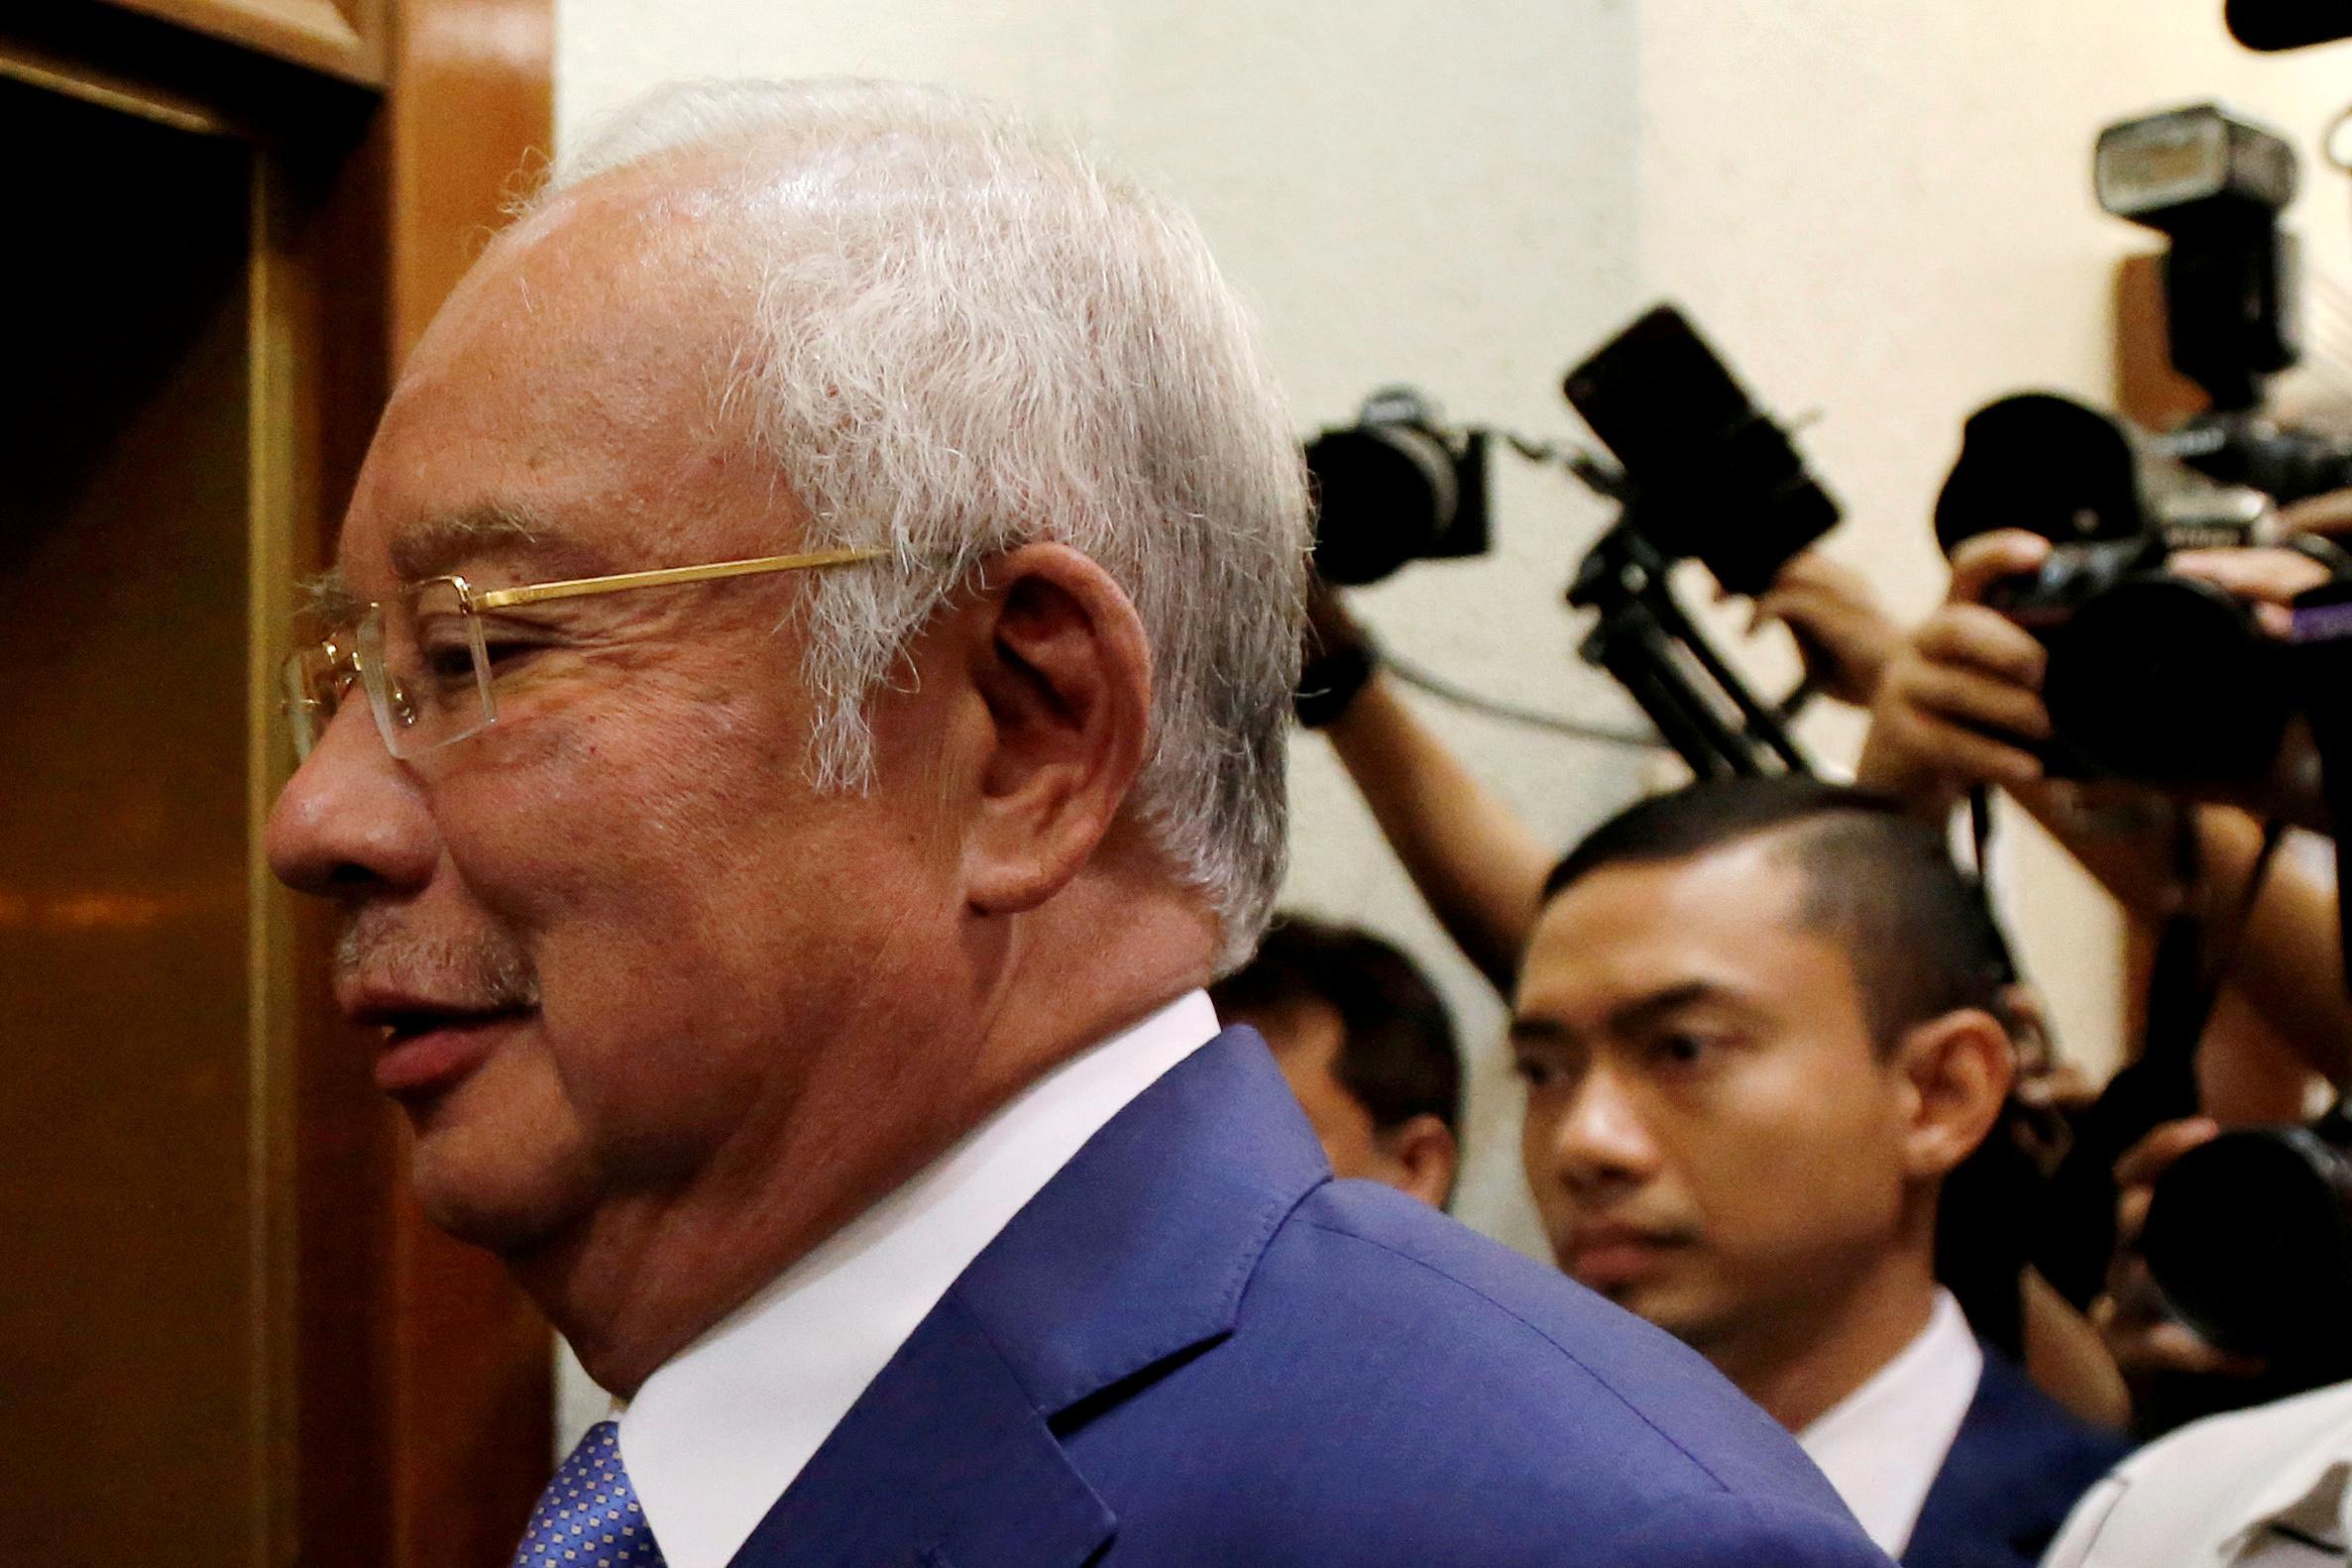 Malaysian prosecutor: Najib orchestrated graft like an 'emperor'